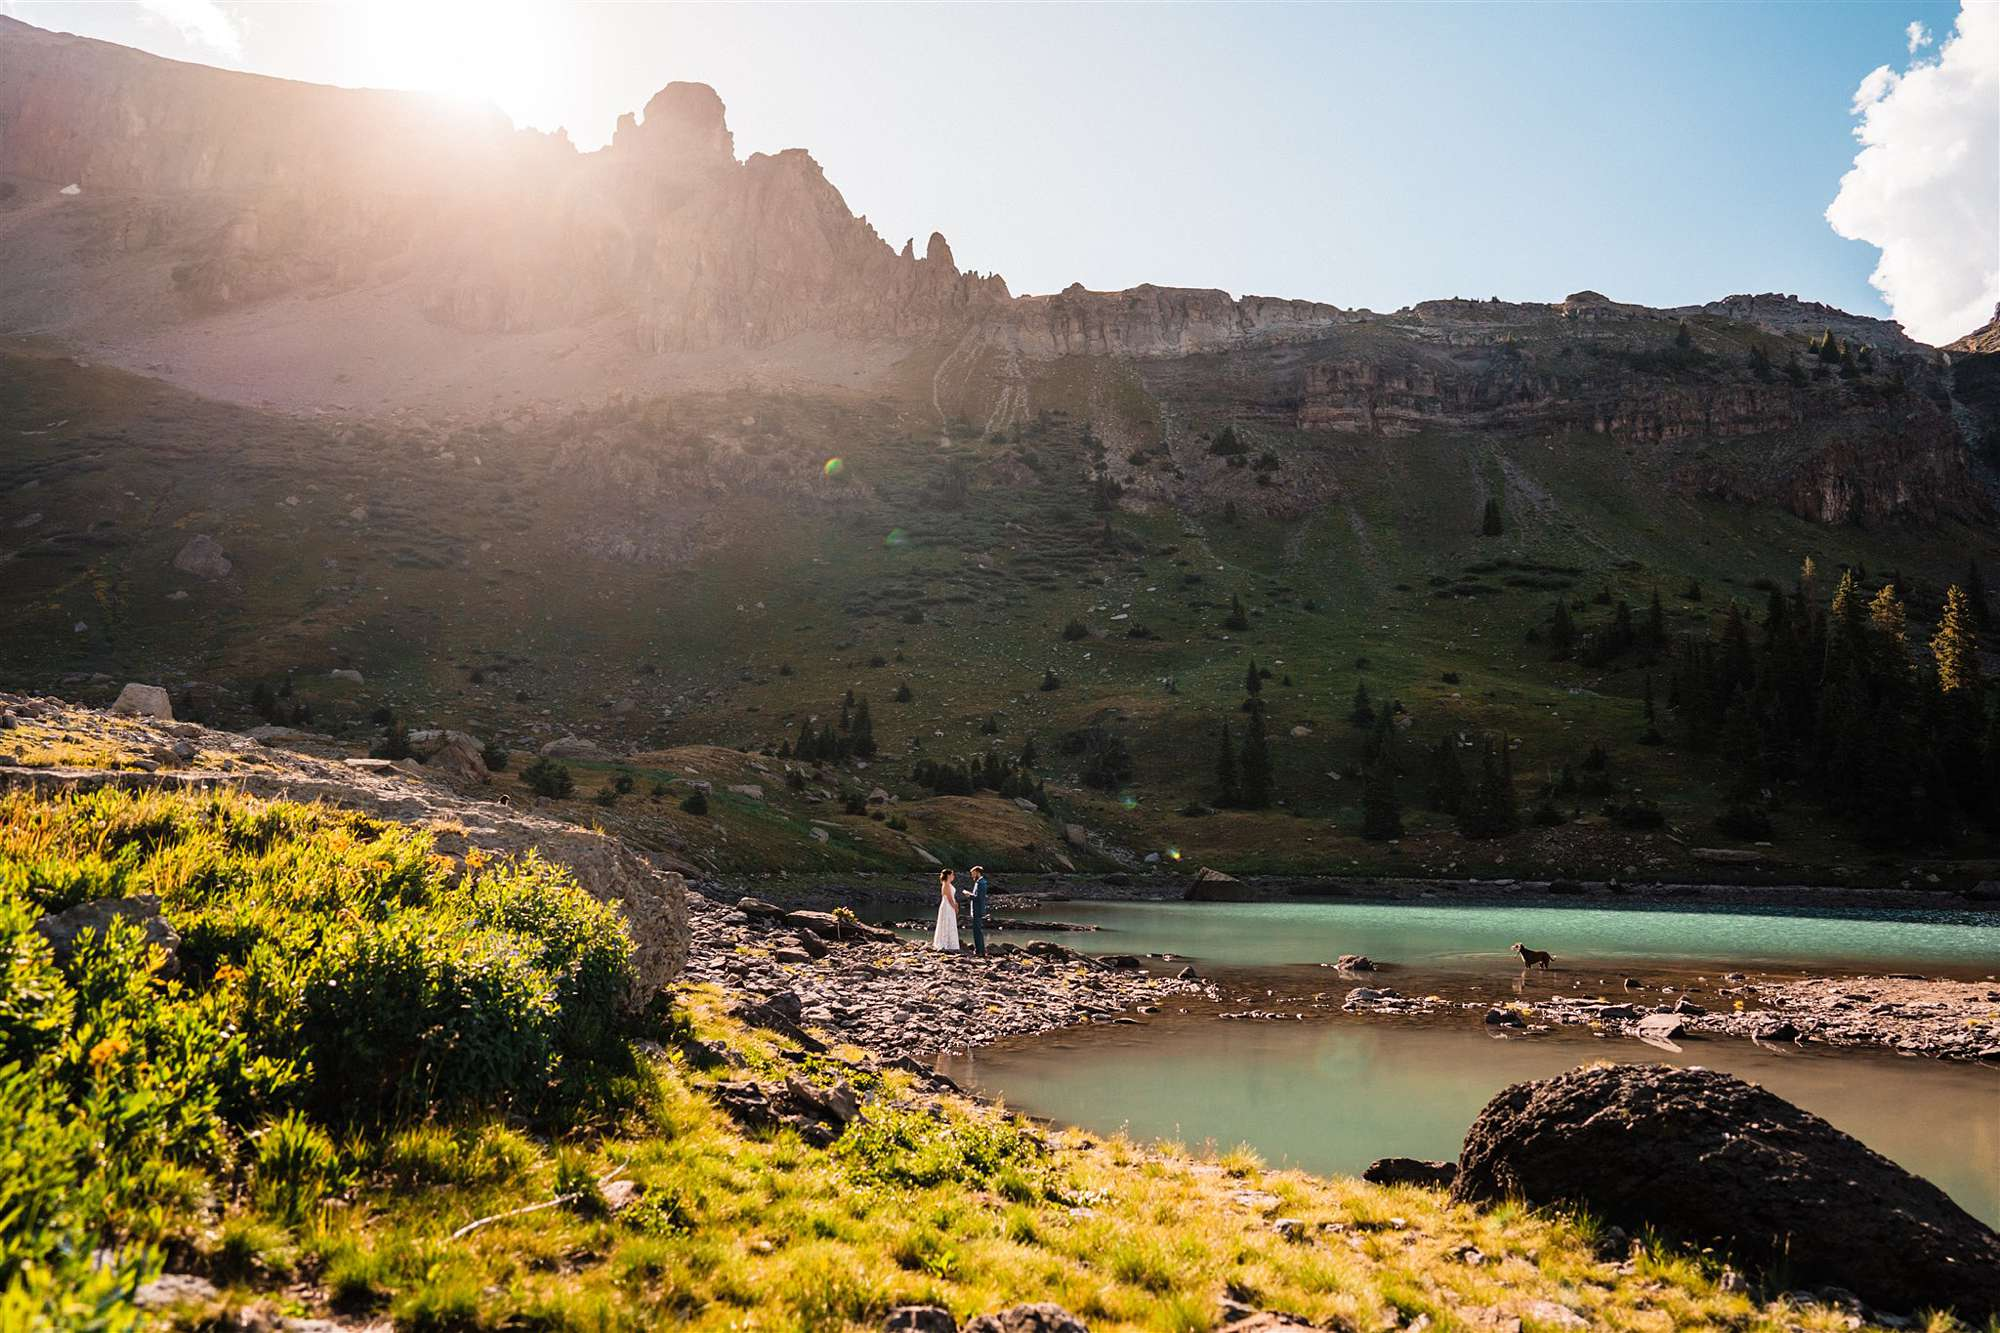 Colorado_Jeeping_Elopement_Emily_Matt_The_Foxes_Photography_0028.jpg